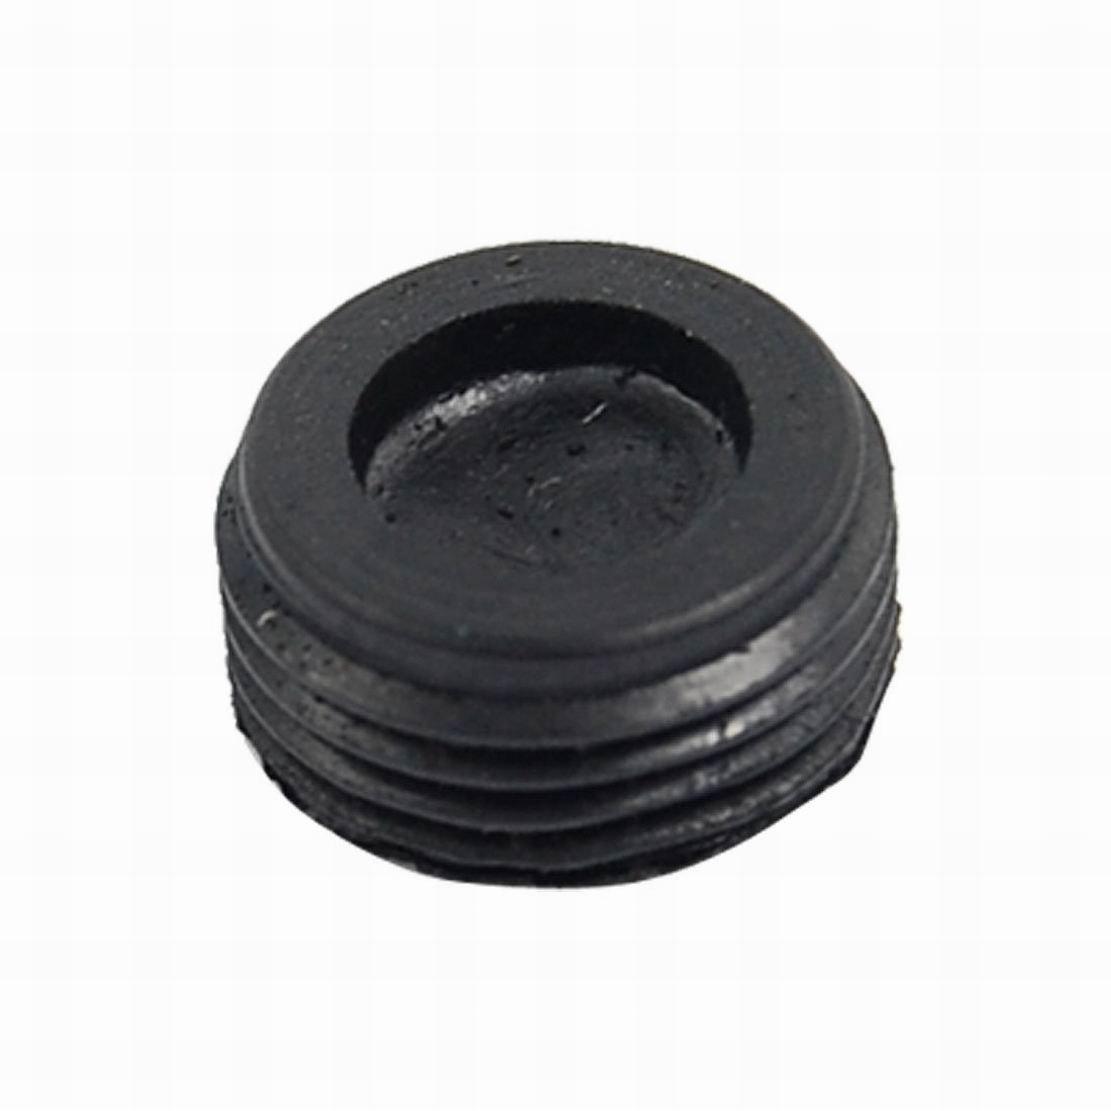 Ugtell 20 Pcs Threaded 12mm Dia Carbon Brush Holder Back Cover